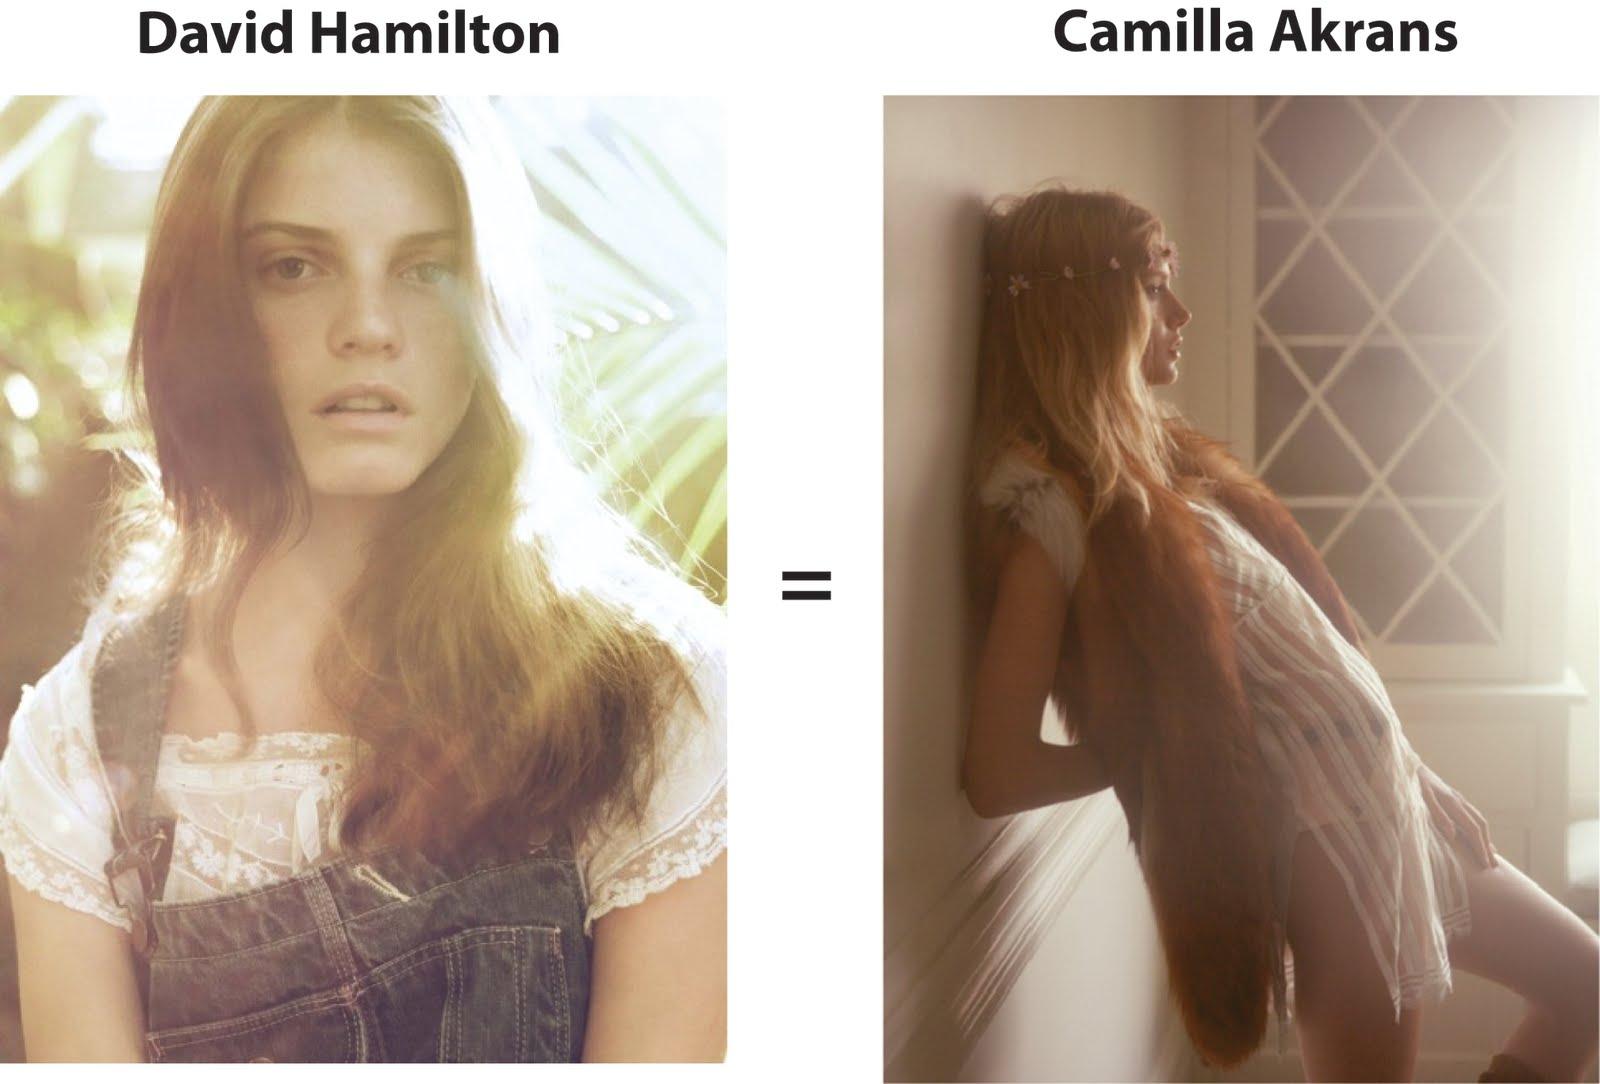 http://1.bp.blogspot.com/_67_nzHcq5iE/S8Ocau_przI/AAAAAAAAACk/lu9EkOLZmJg/s1600/David+Hamilton%3DCamilla+Akrans.jpg